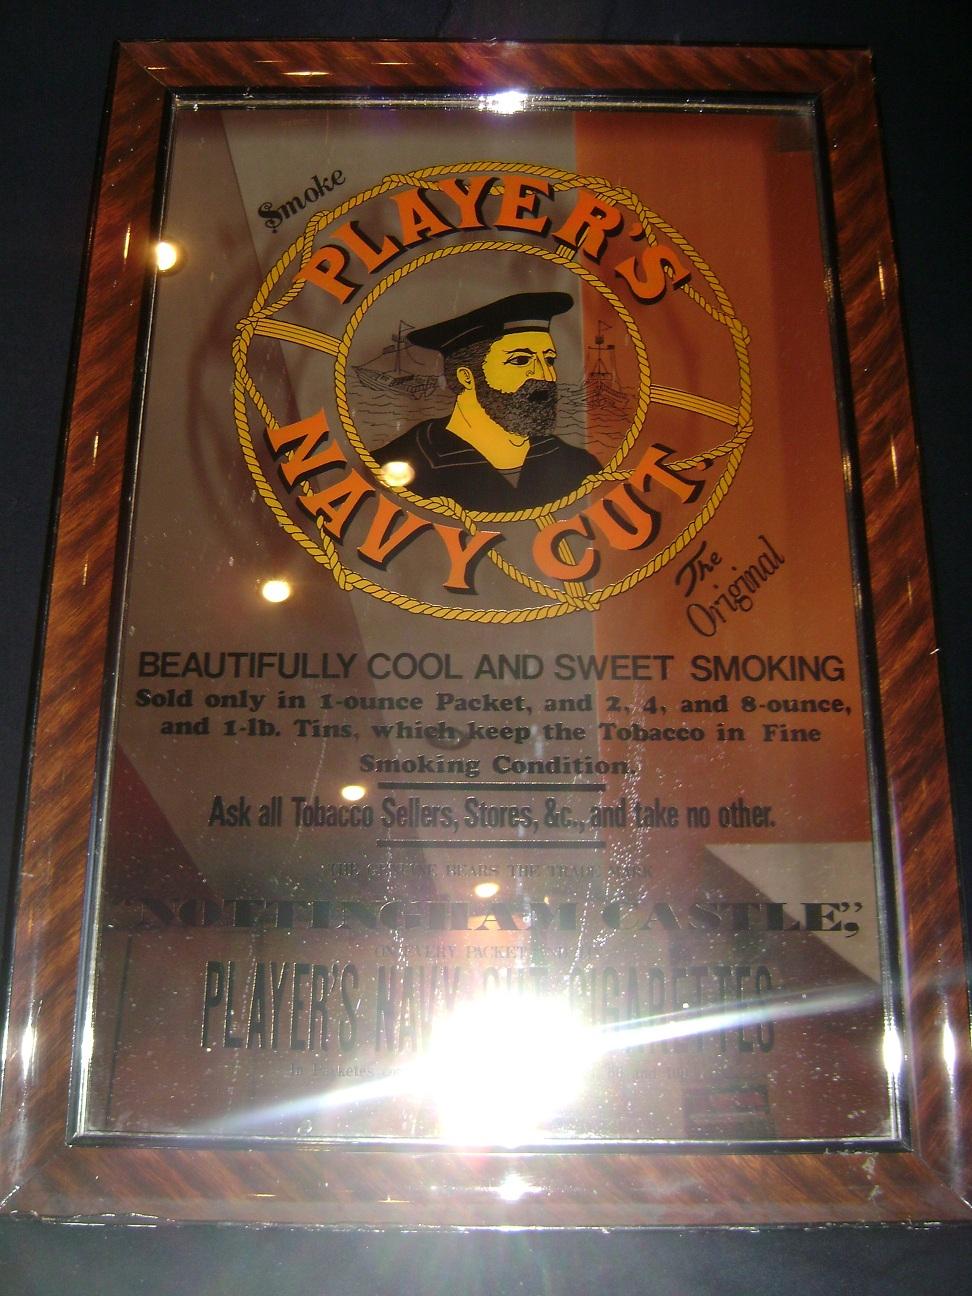 Ogledalo_reklama_Players_Navy_Cut_Tobacco_1.JPG